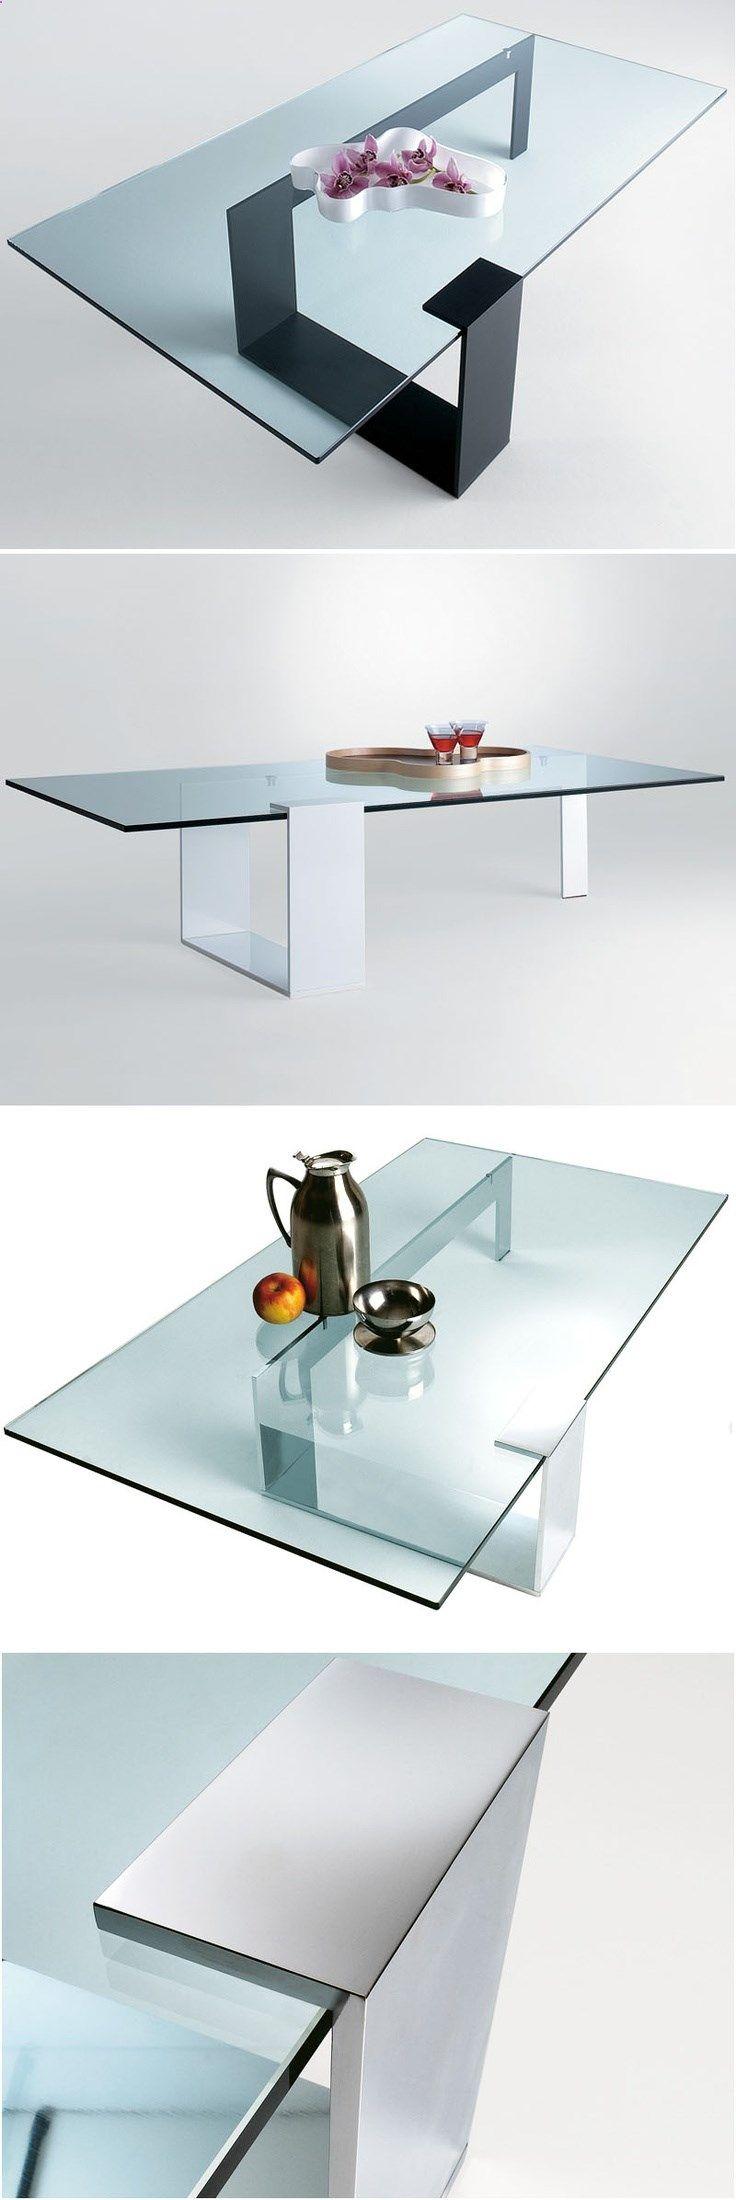 Giulio Mancini Plinsky Glass Coffee Table By Tonelli Modern Glass Coffee Table Glass Furniture Modern Coffee Tables [ 2200 x 736 Pixel ]